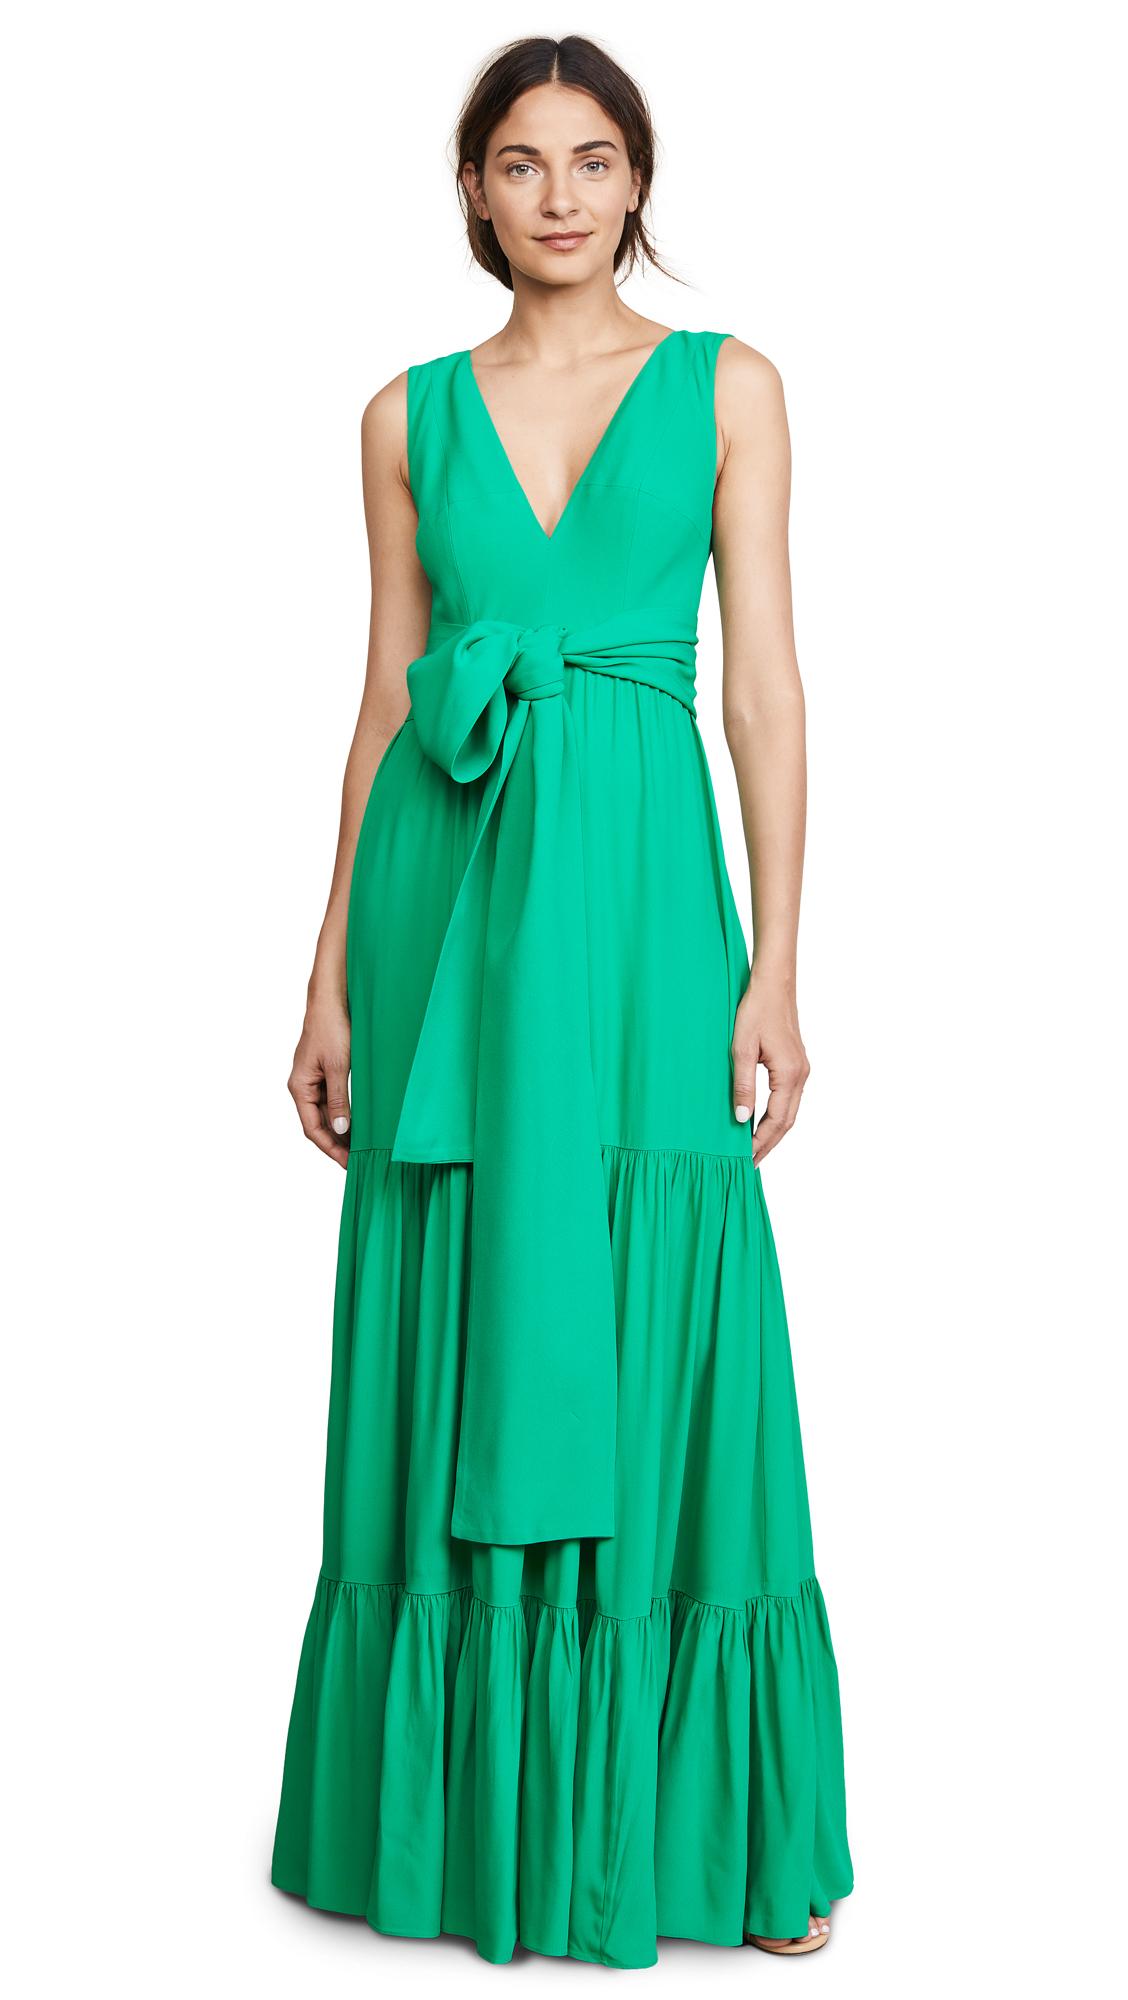 Marni Dress, Green